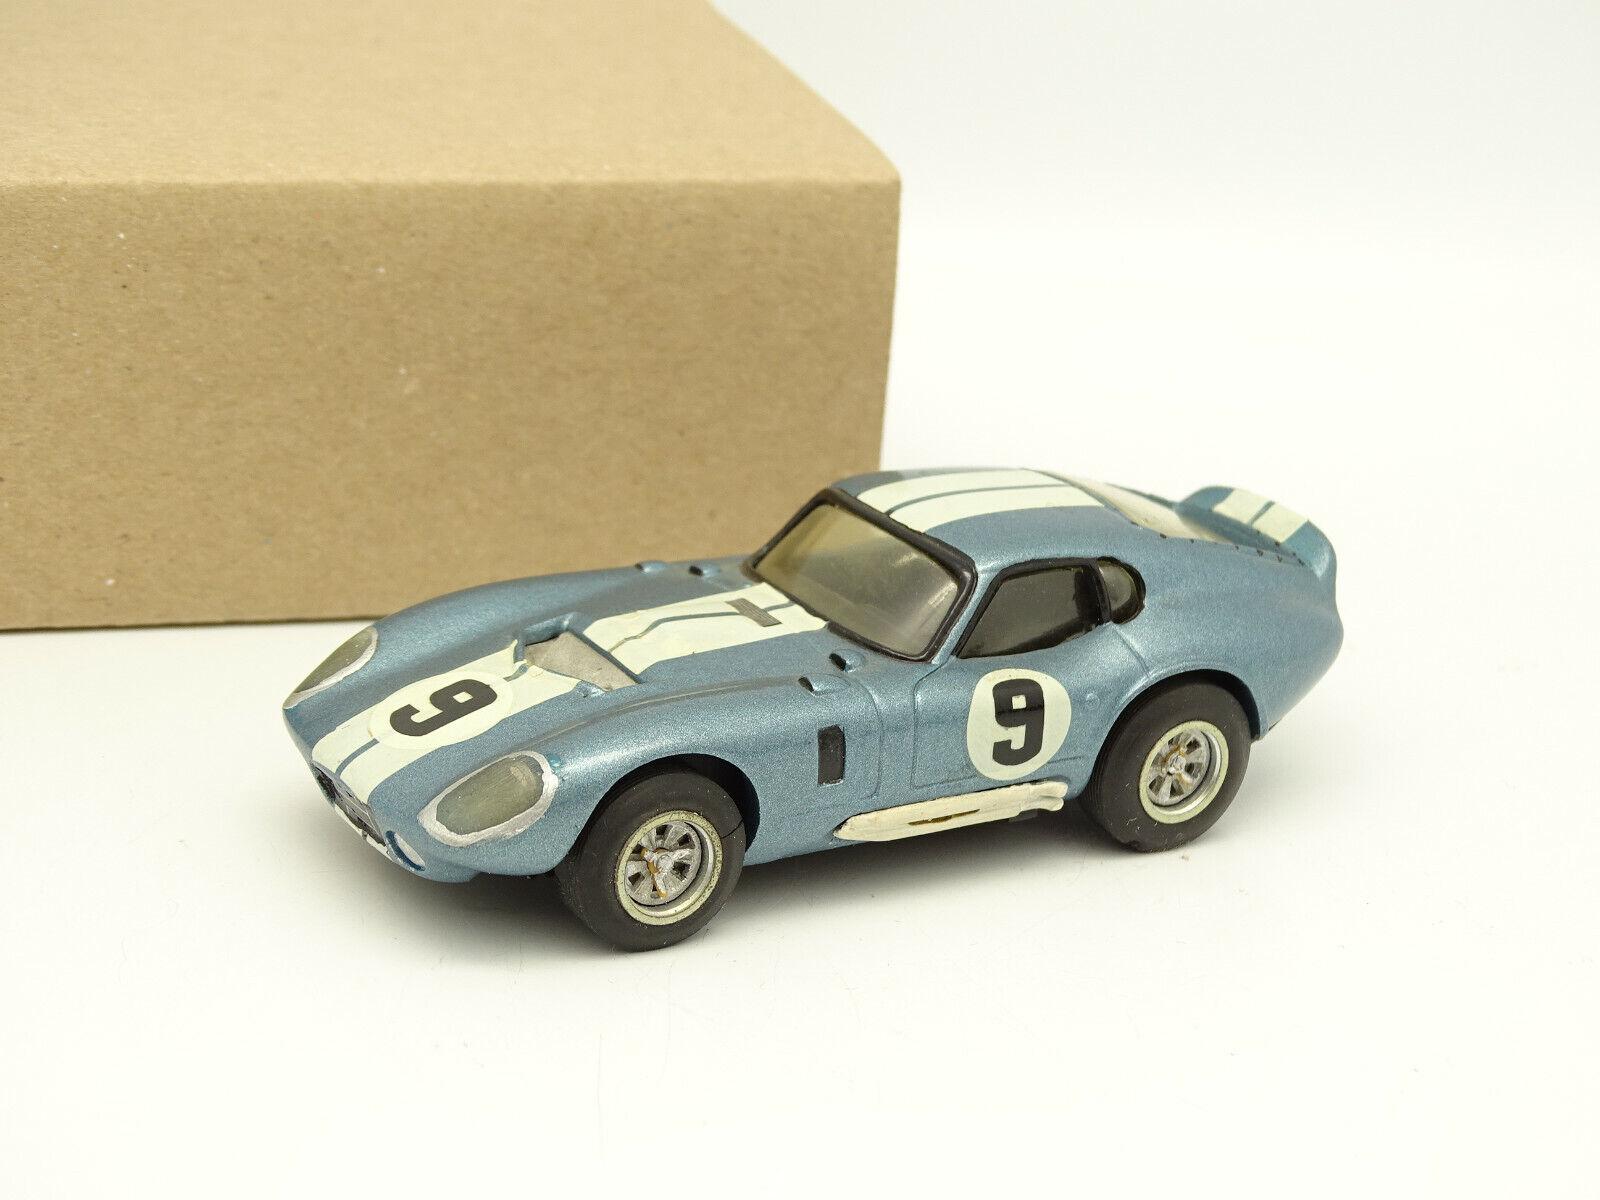 Tenariv Kit Montado Metal 1 43 - Shelby Ford Cobra Daytona Le Mans 1965